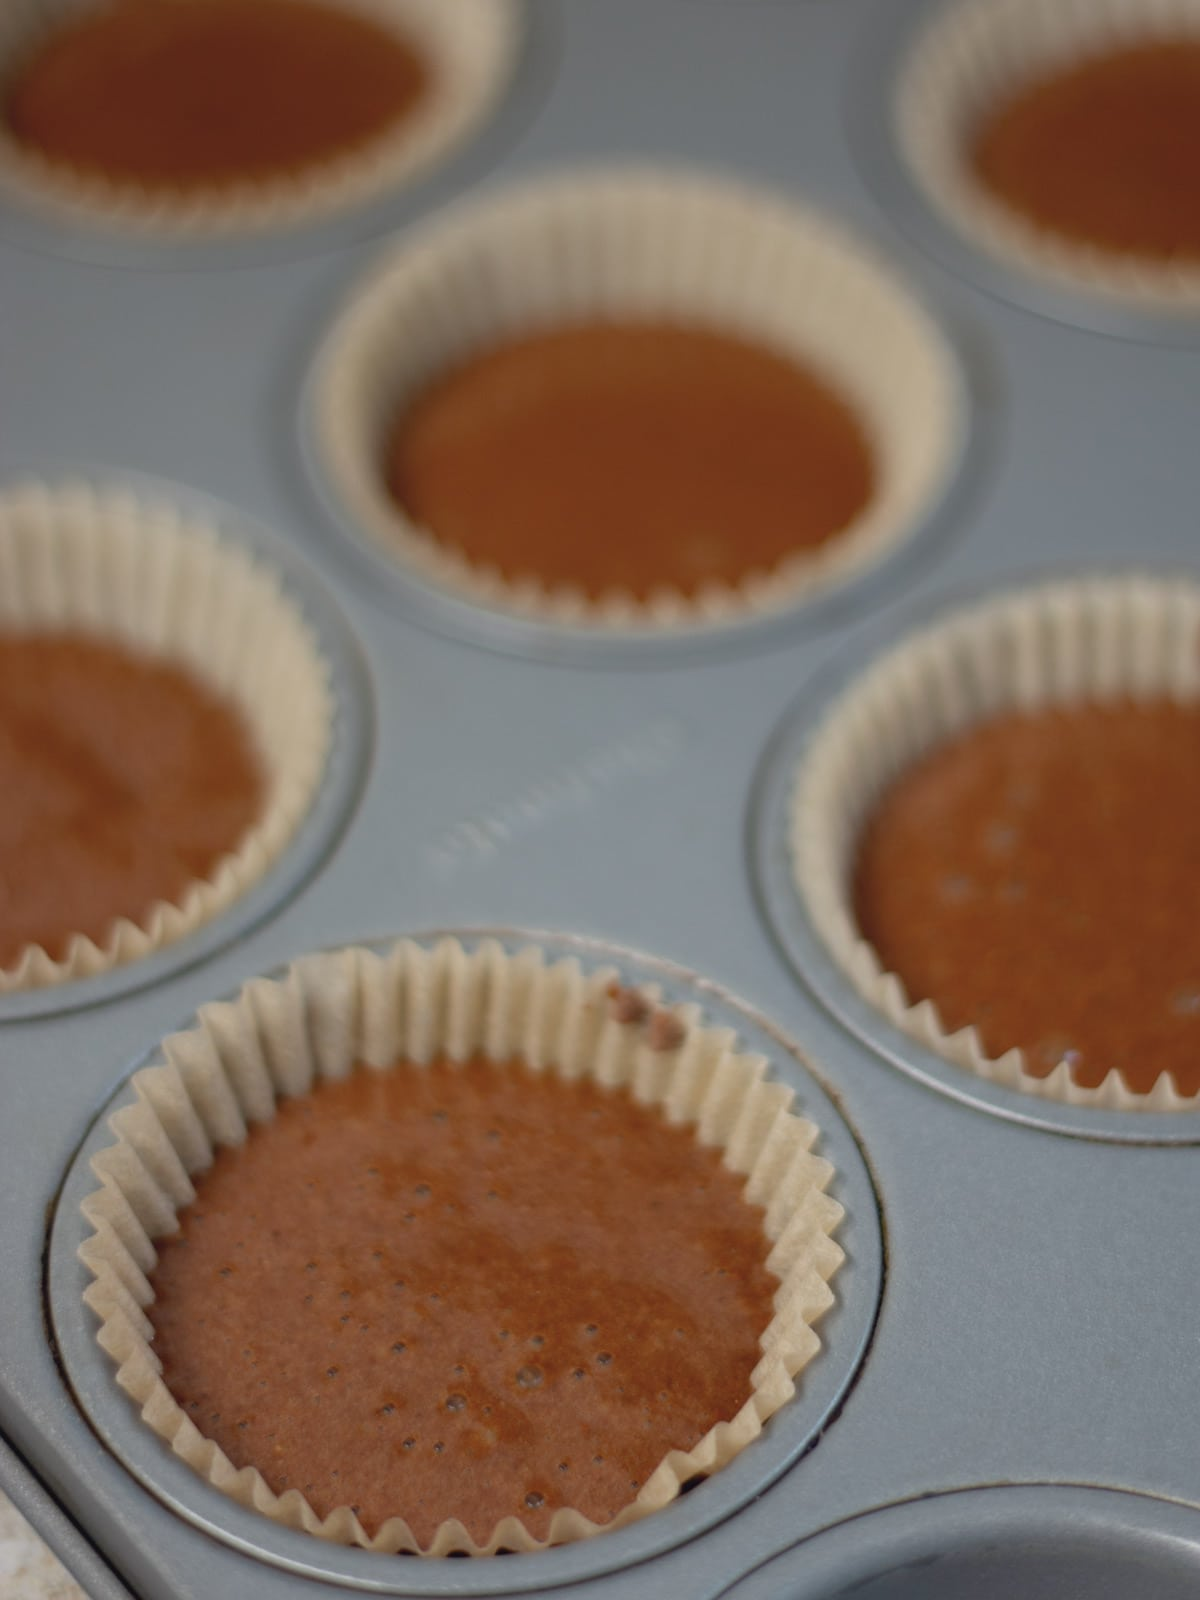 muffin batter in a muffin pan